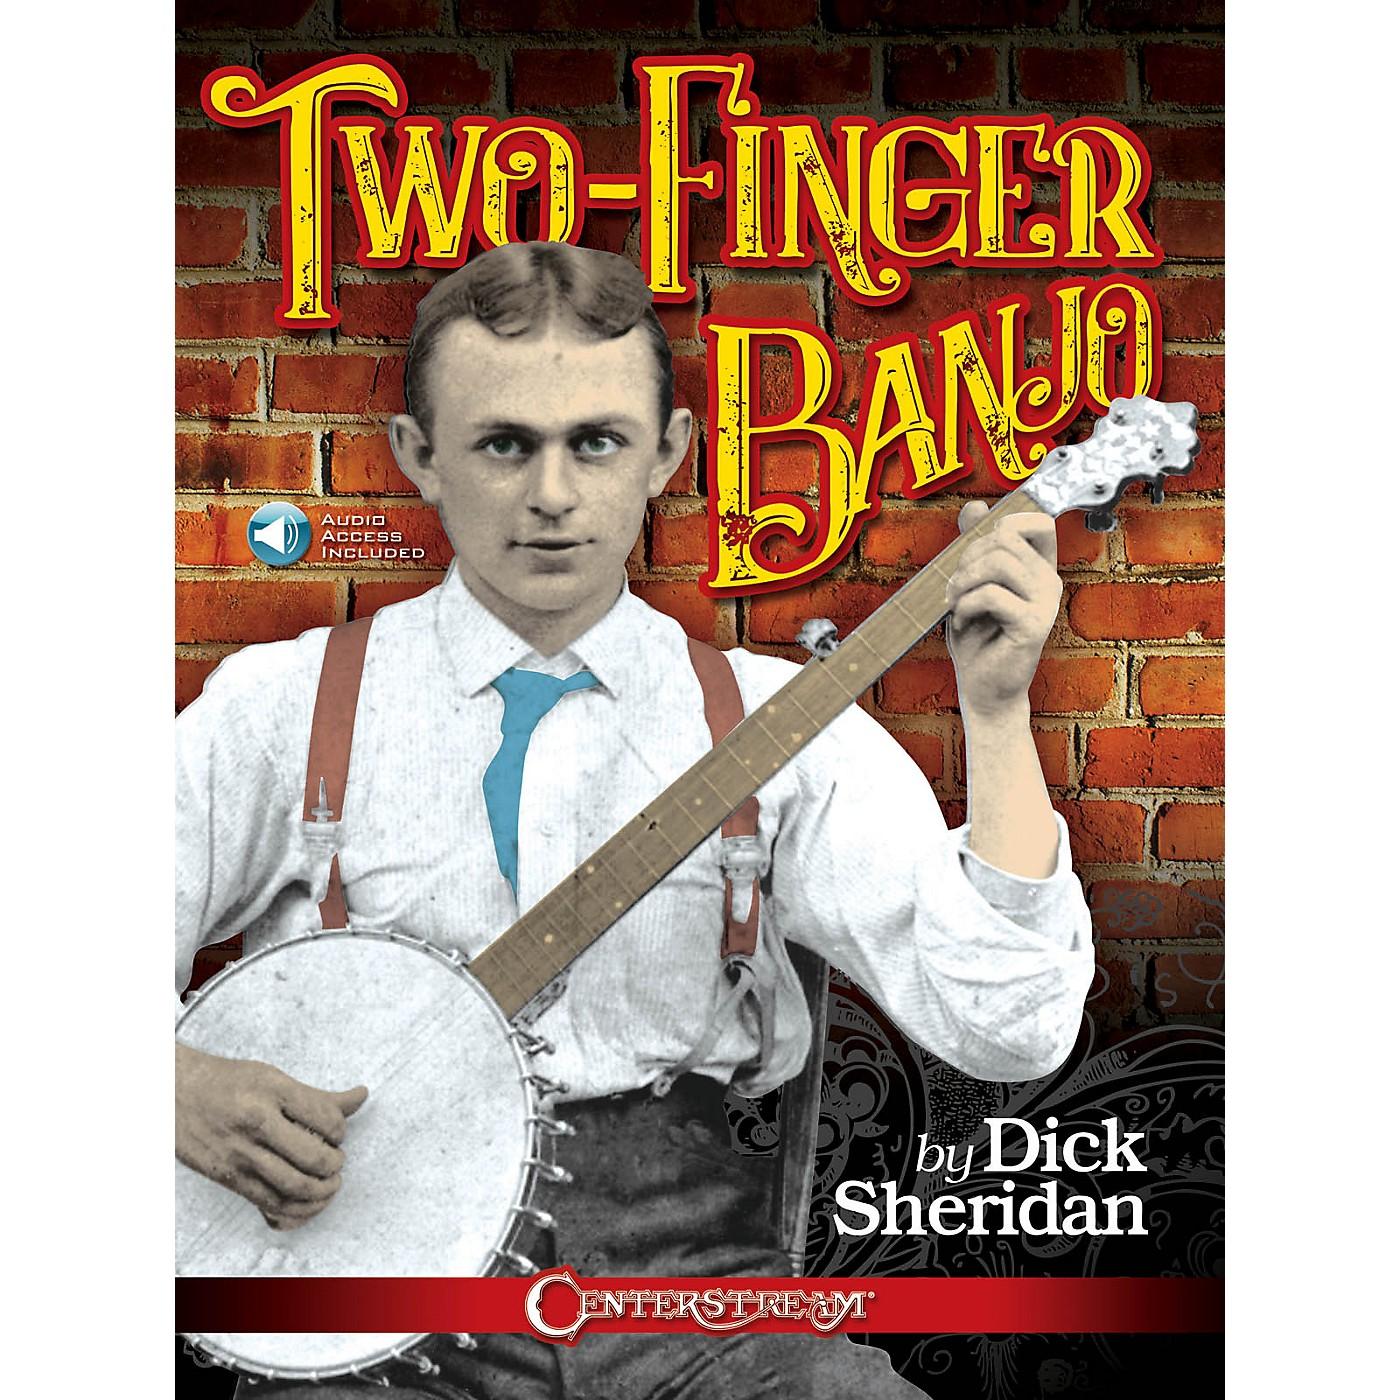 Hal Leonard Two-Finger Banjo by Dick Sheridan Book/Audio Online thumbnail